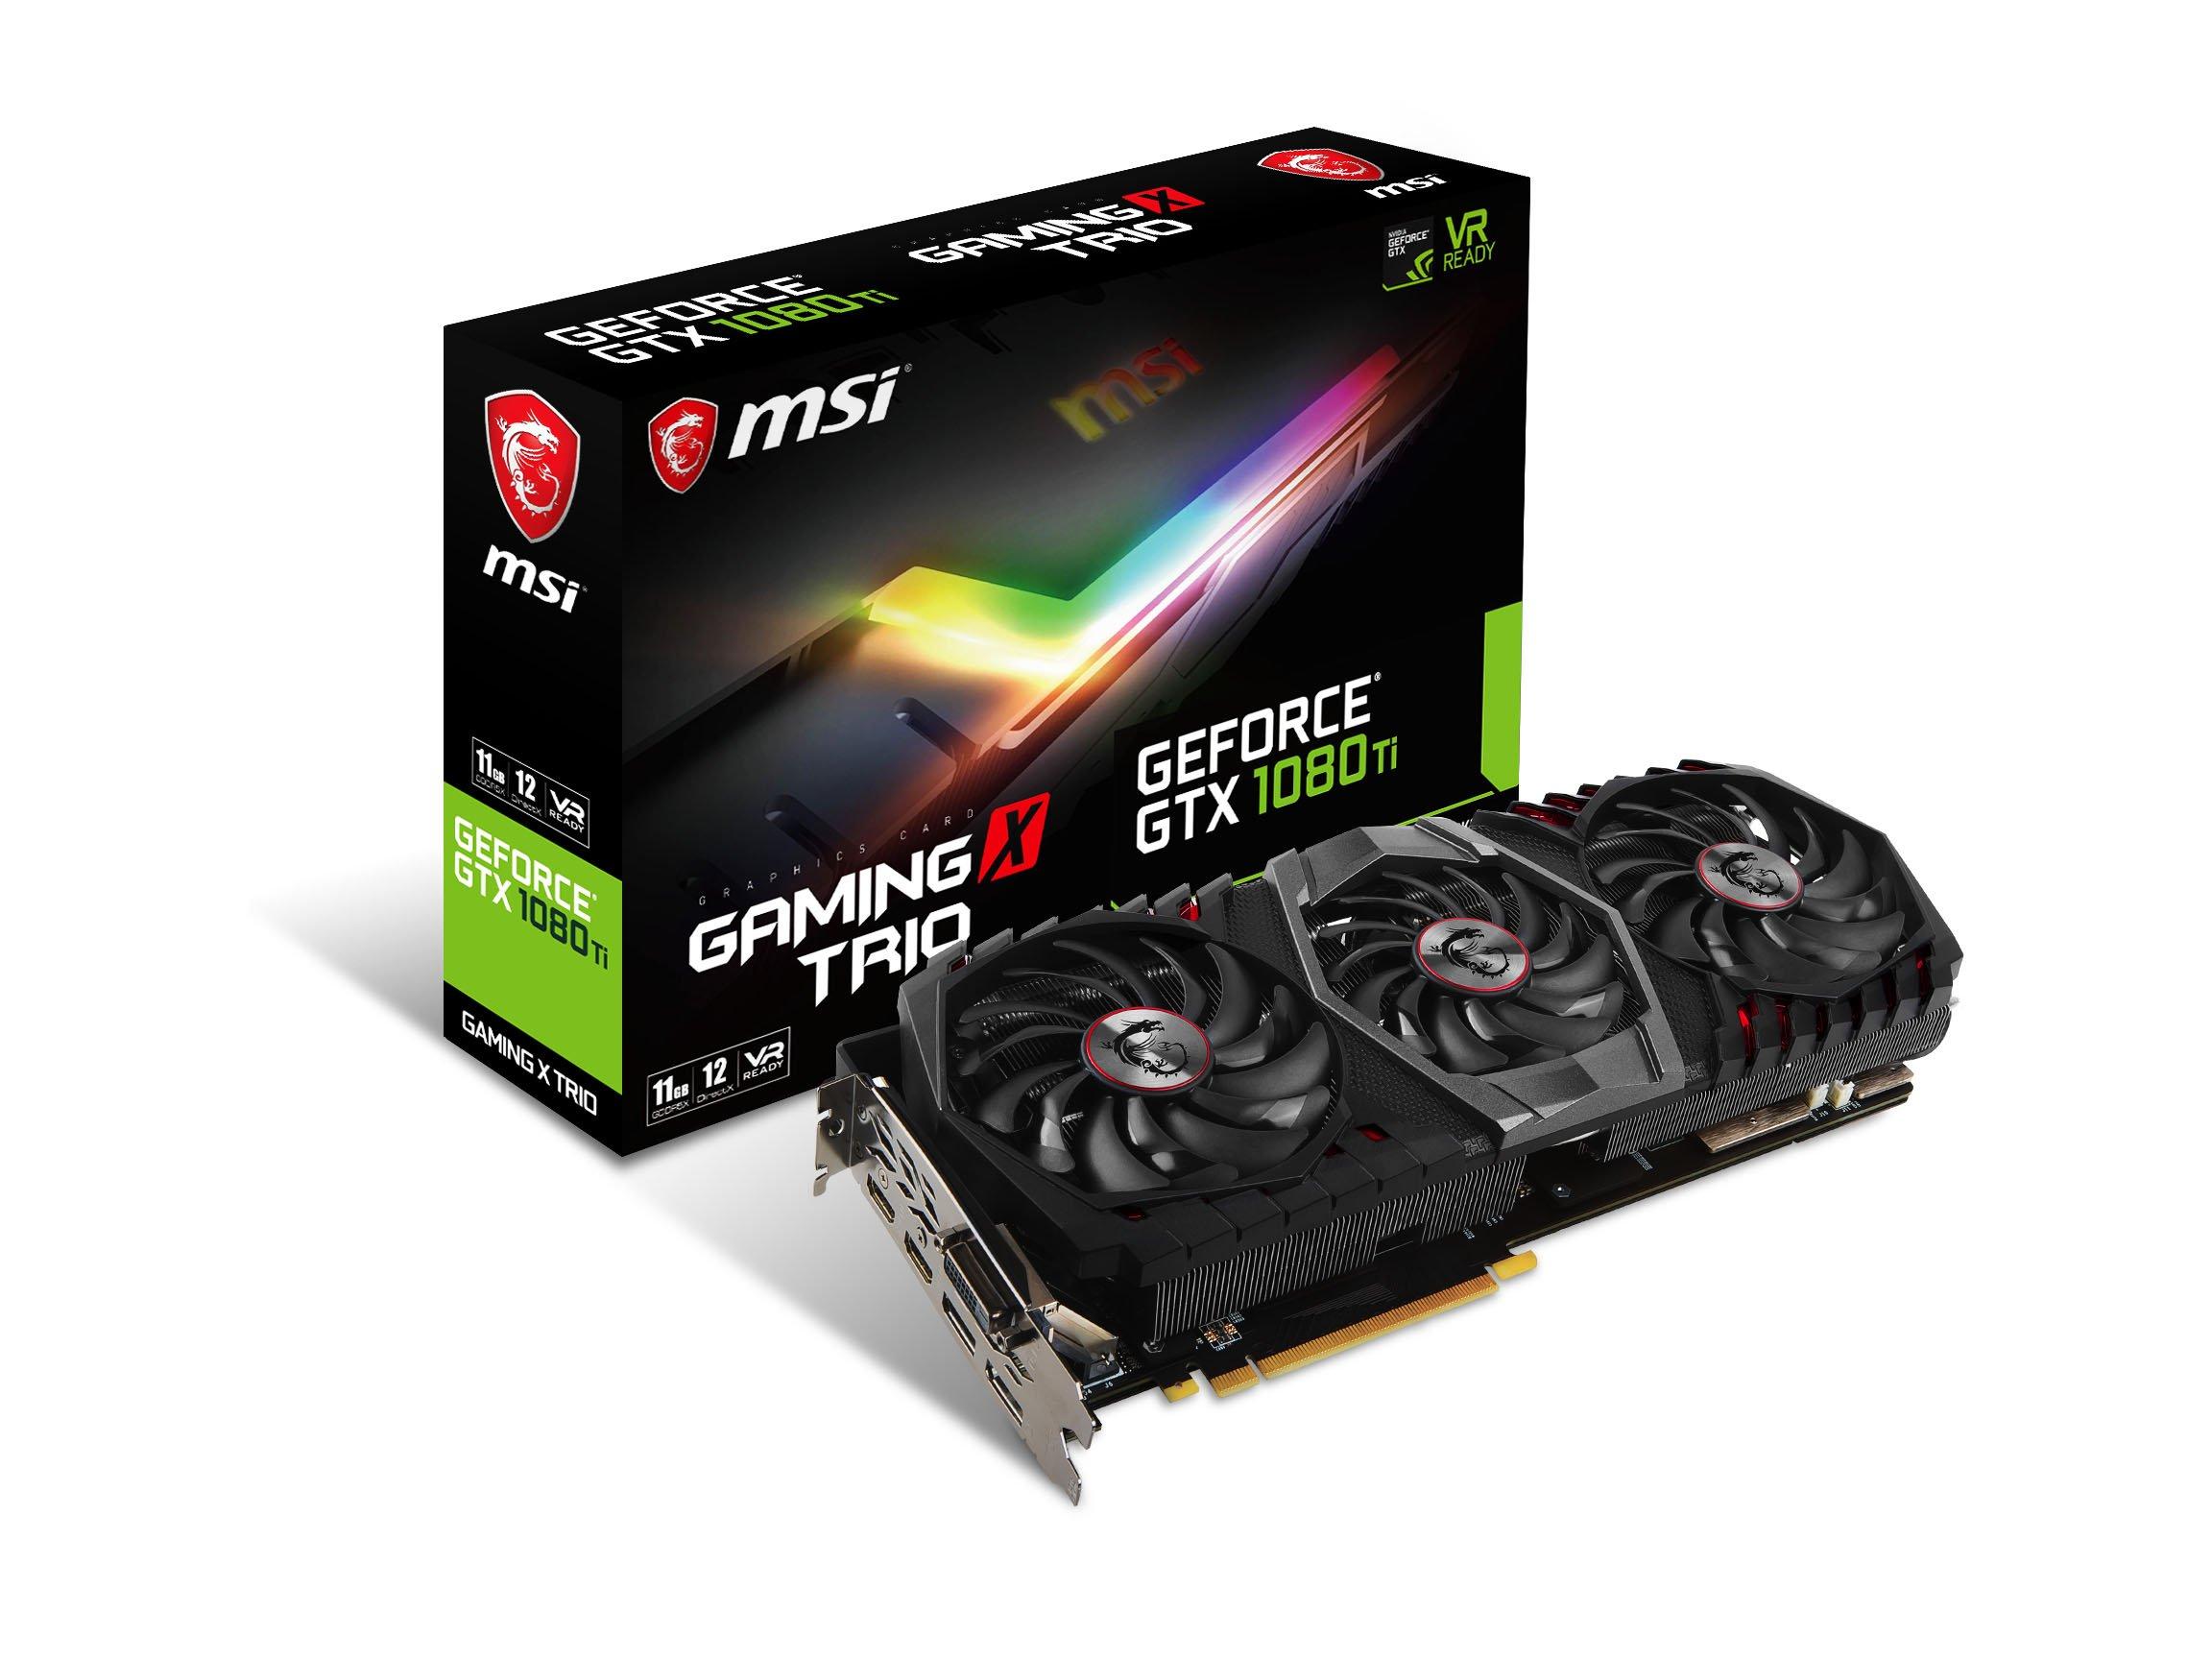 MSI GAMING GeForce GTX 1080 Ti 11GB GDDR5X 352-bit DirectX 12 VR Ready Graphics Card Black/Black (GTX 1080 TI GAMING X TRIO)